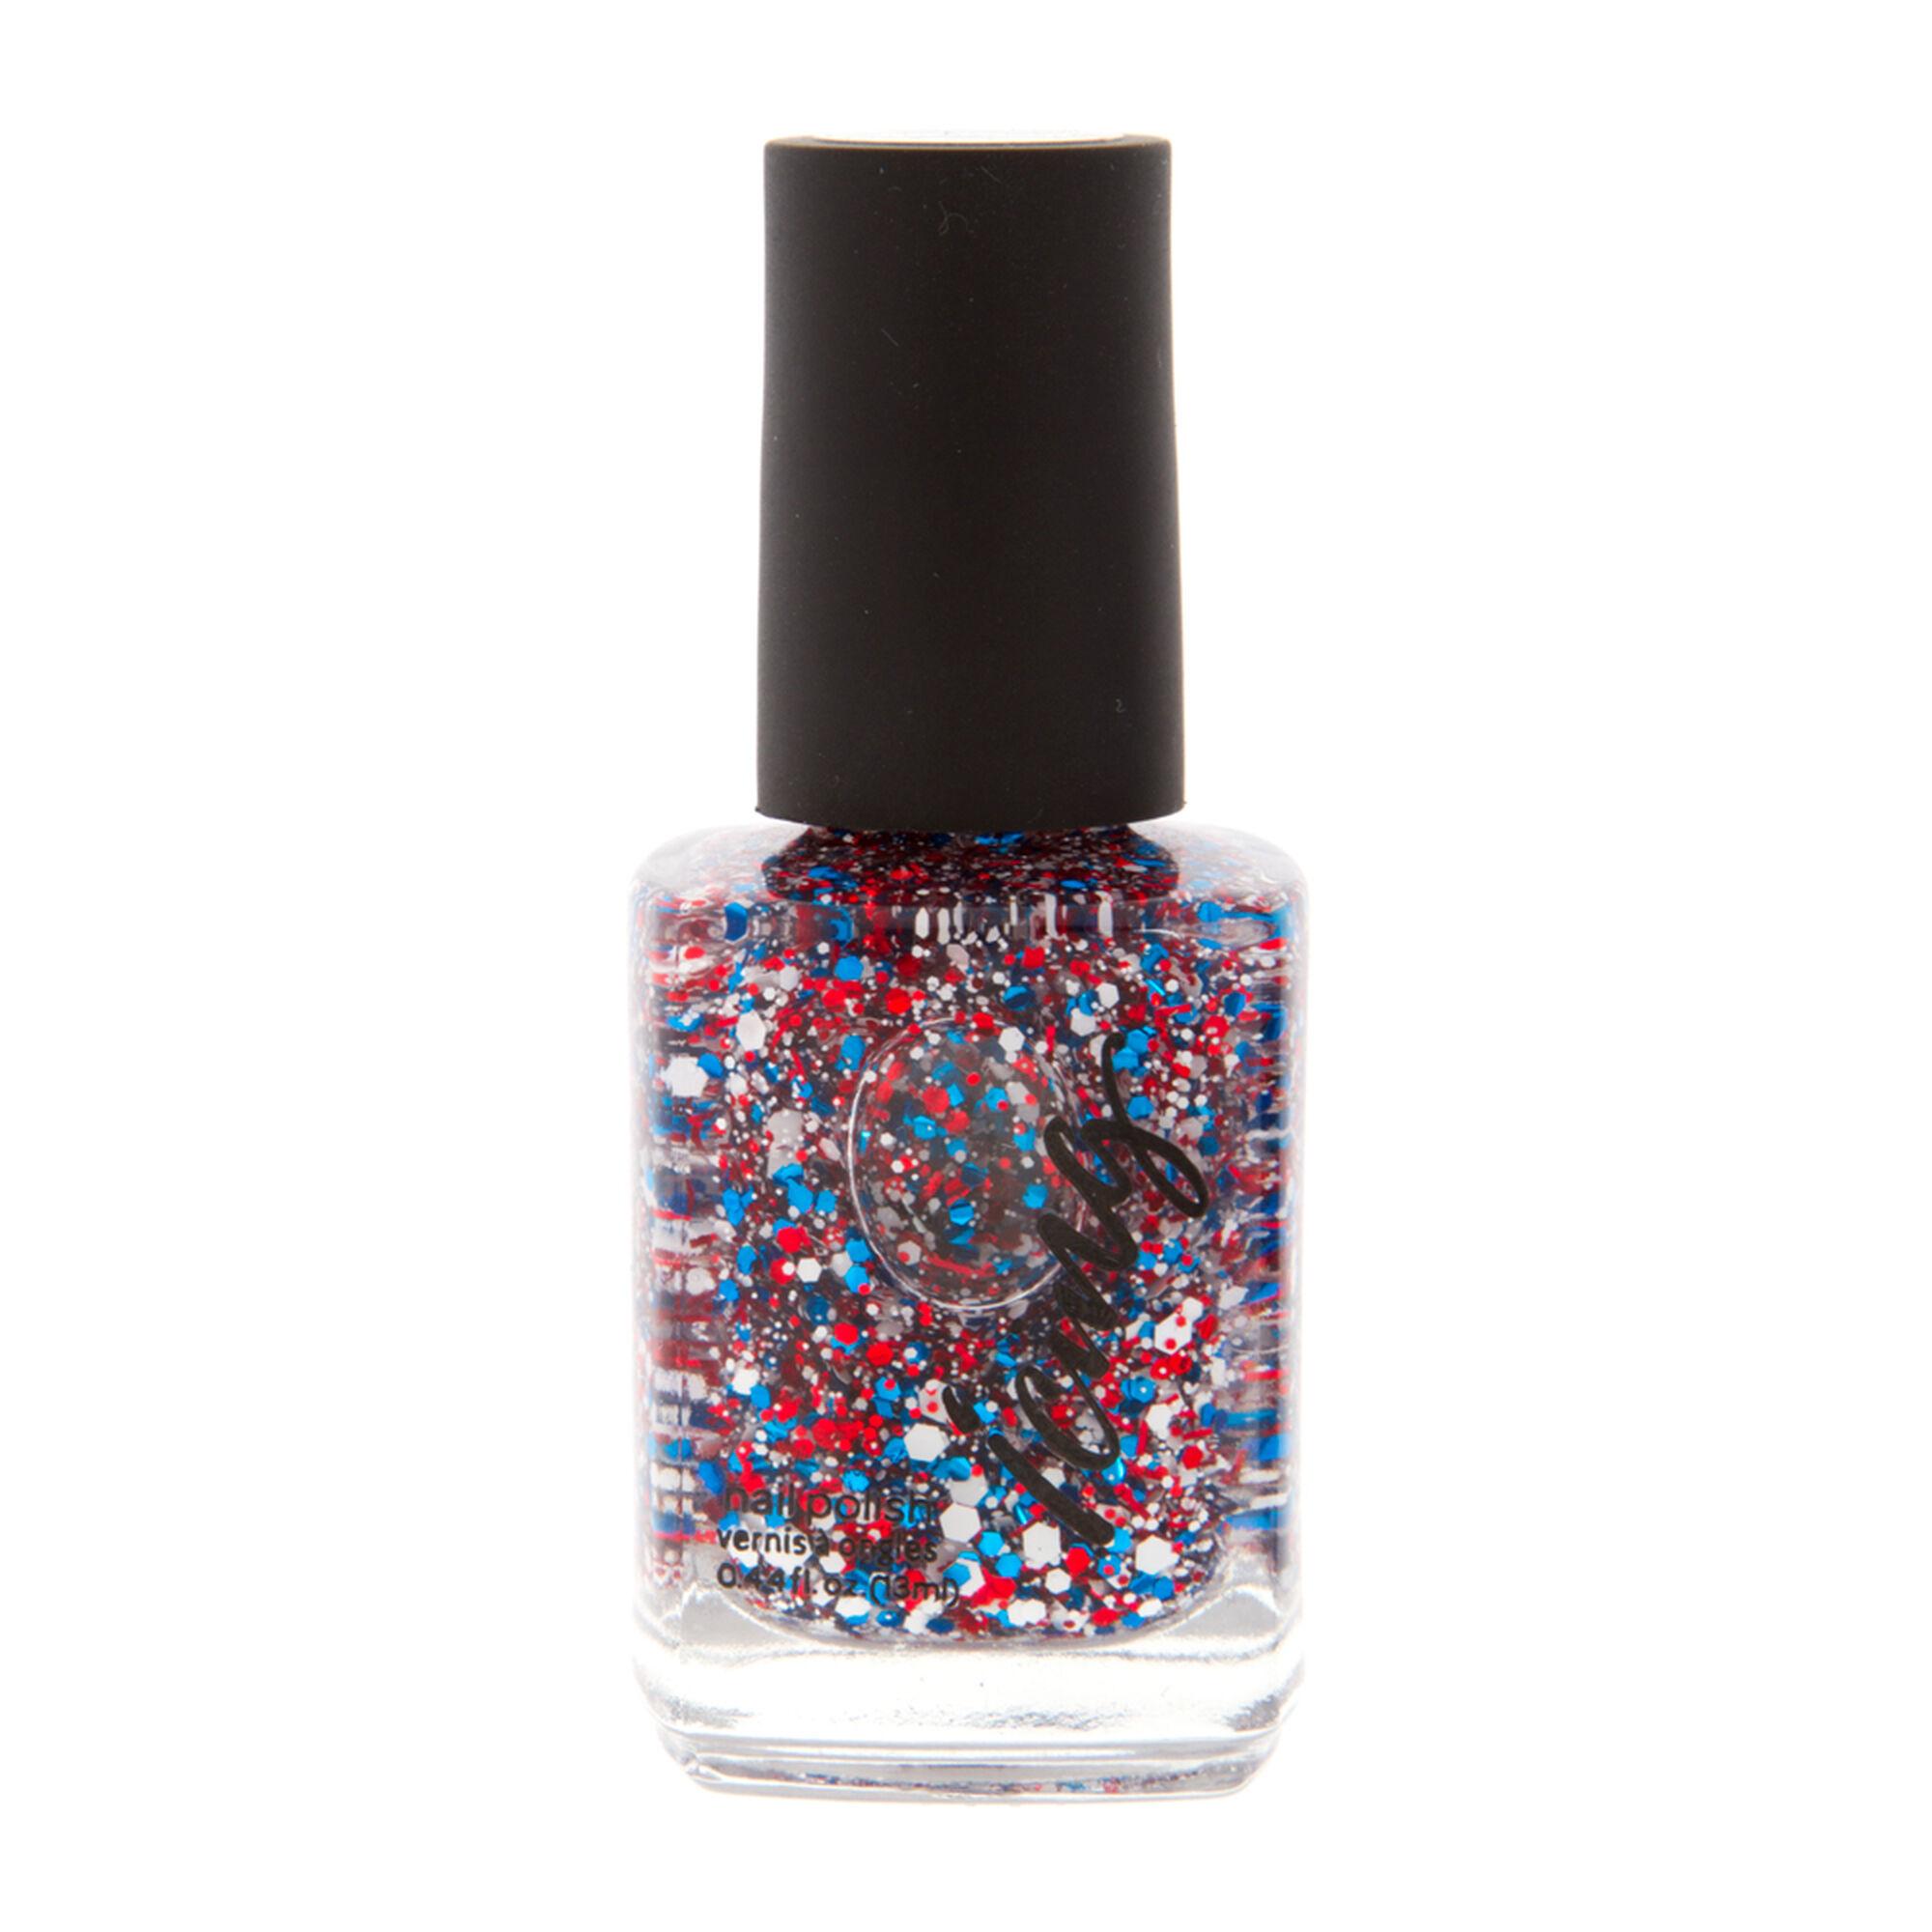 Murica! Splatter Nail Polish | Icing US